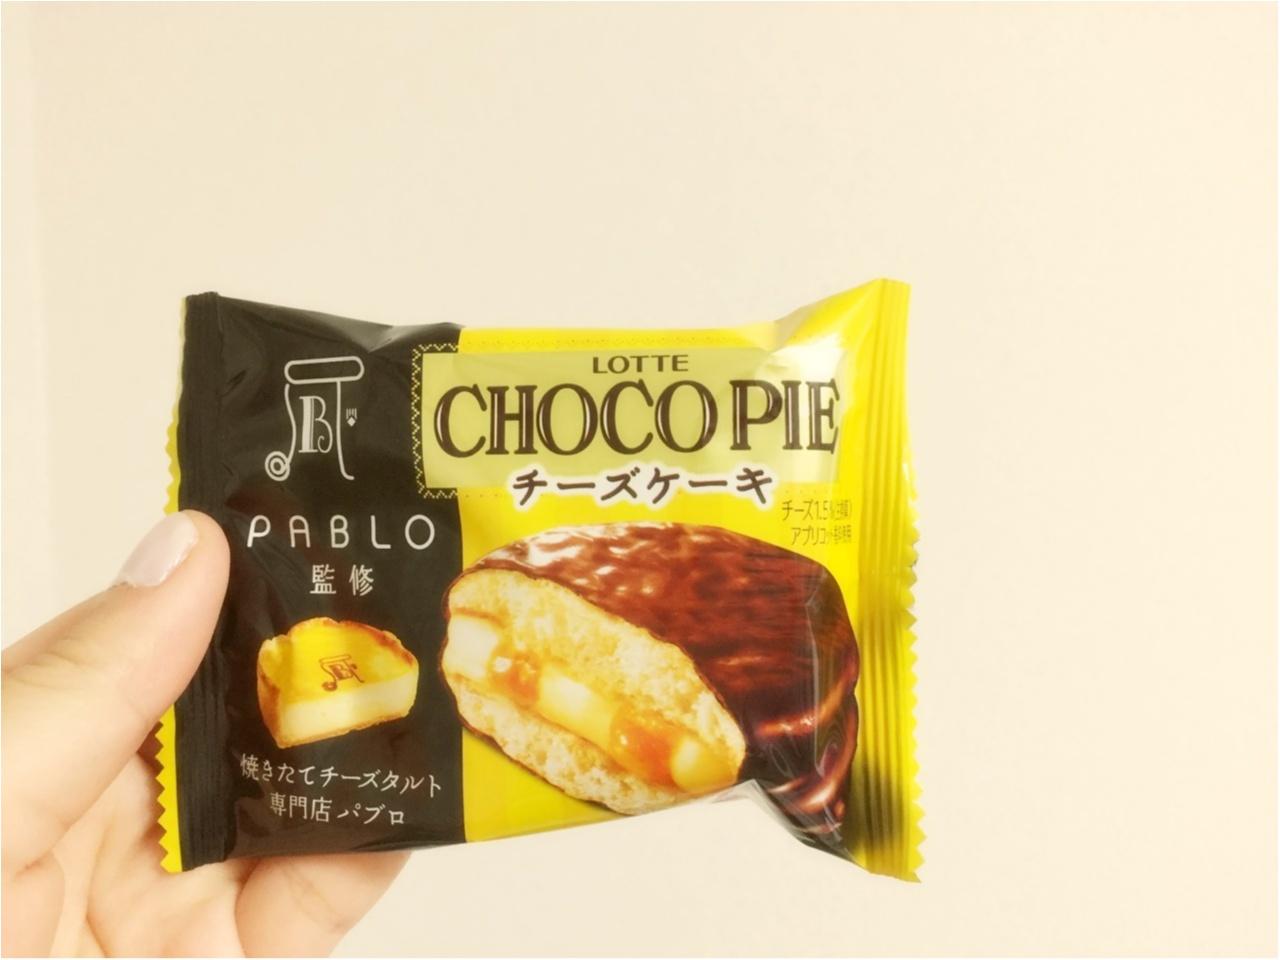 PABLO監修CHOCOPIEチーズケーキ♡*_1